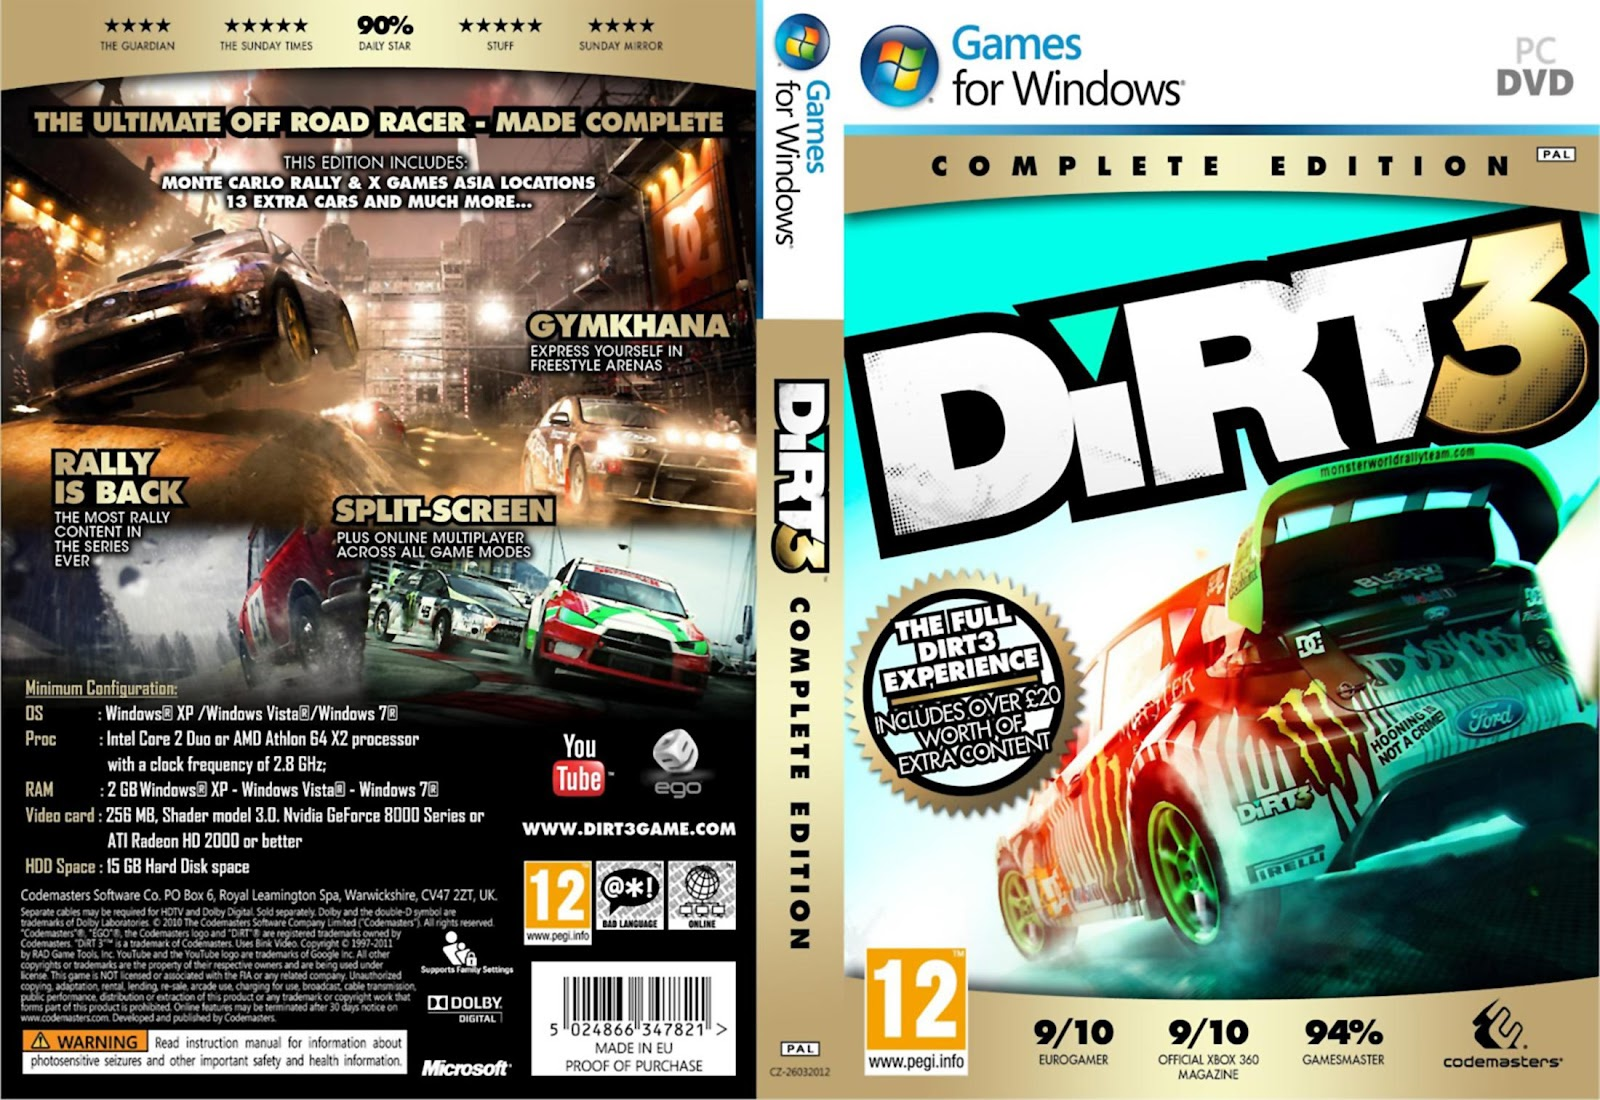 download dirt 3 complete edition pcdvd fightclub. Black Bedroom Furniture Sets. Home Design Ideas